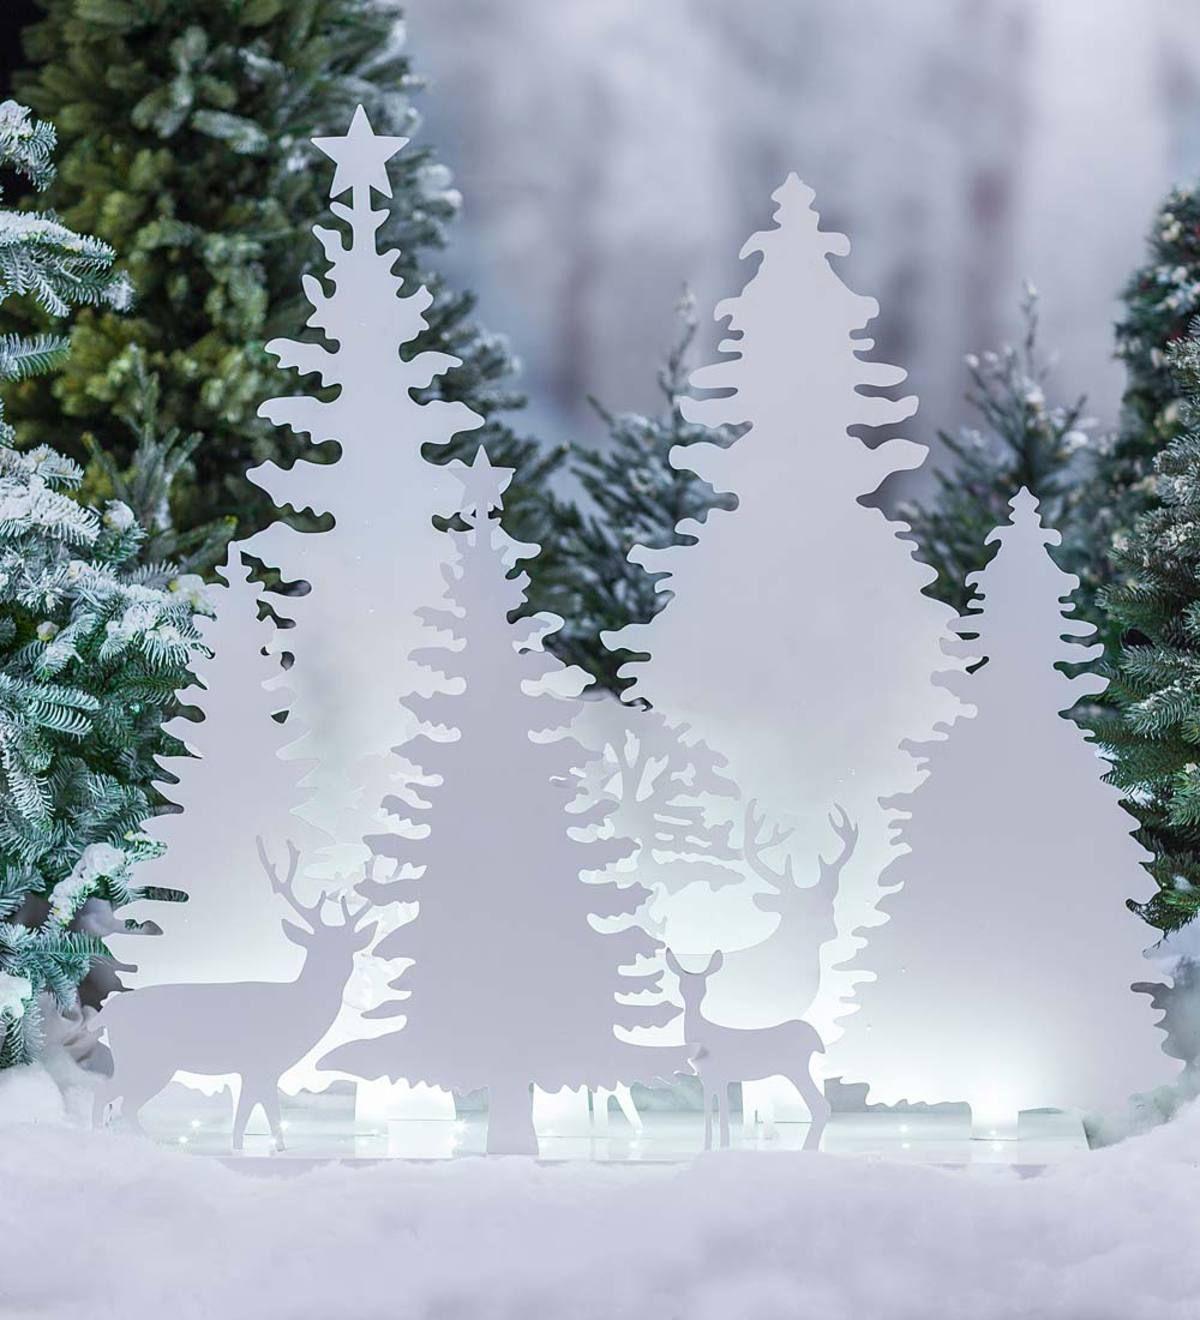 5 Foot Diameter All Metal Outdoor Christmas Tree Base For 10 12 Or 15 Trees Outdoor Christmas Tree Christmas Tree Base Outdoor Christmas